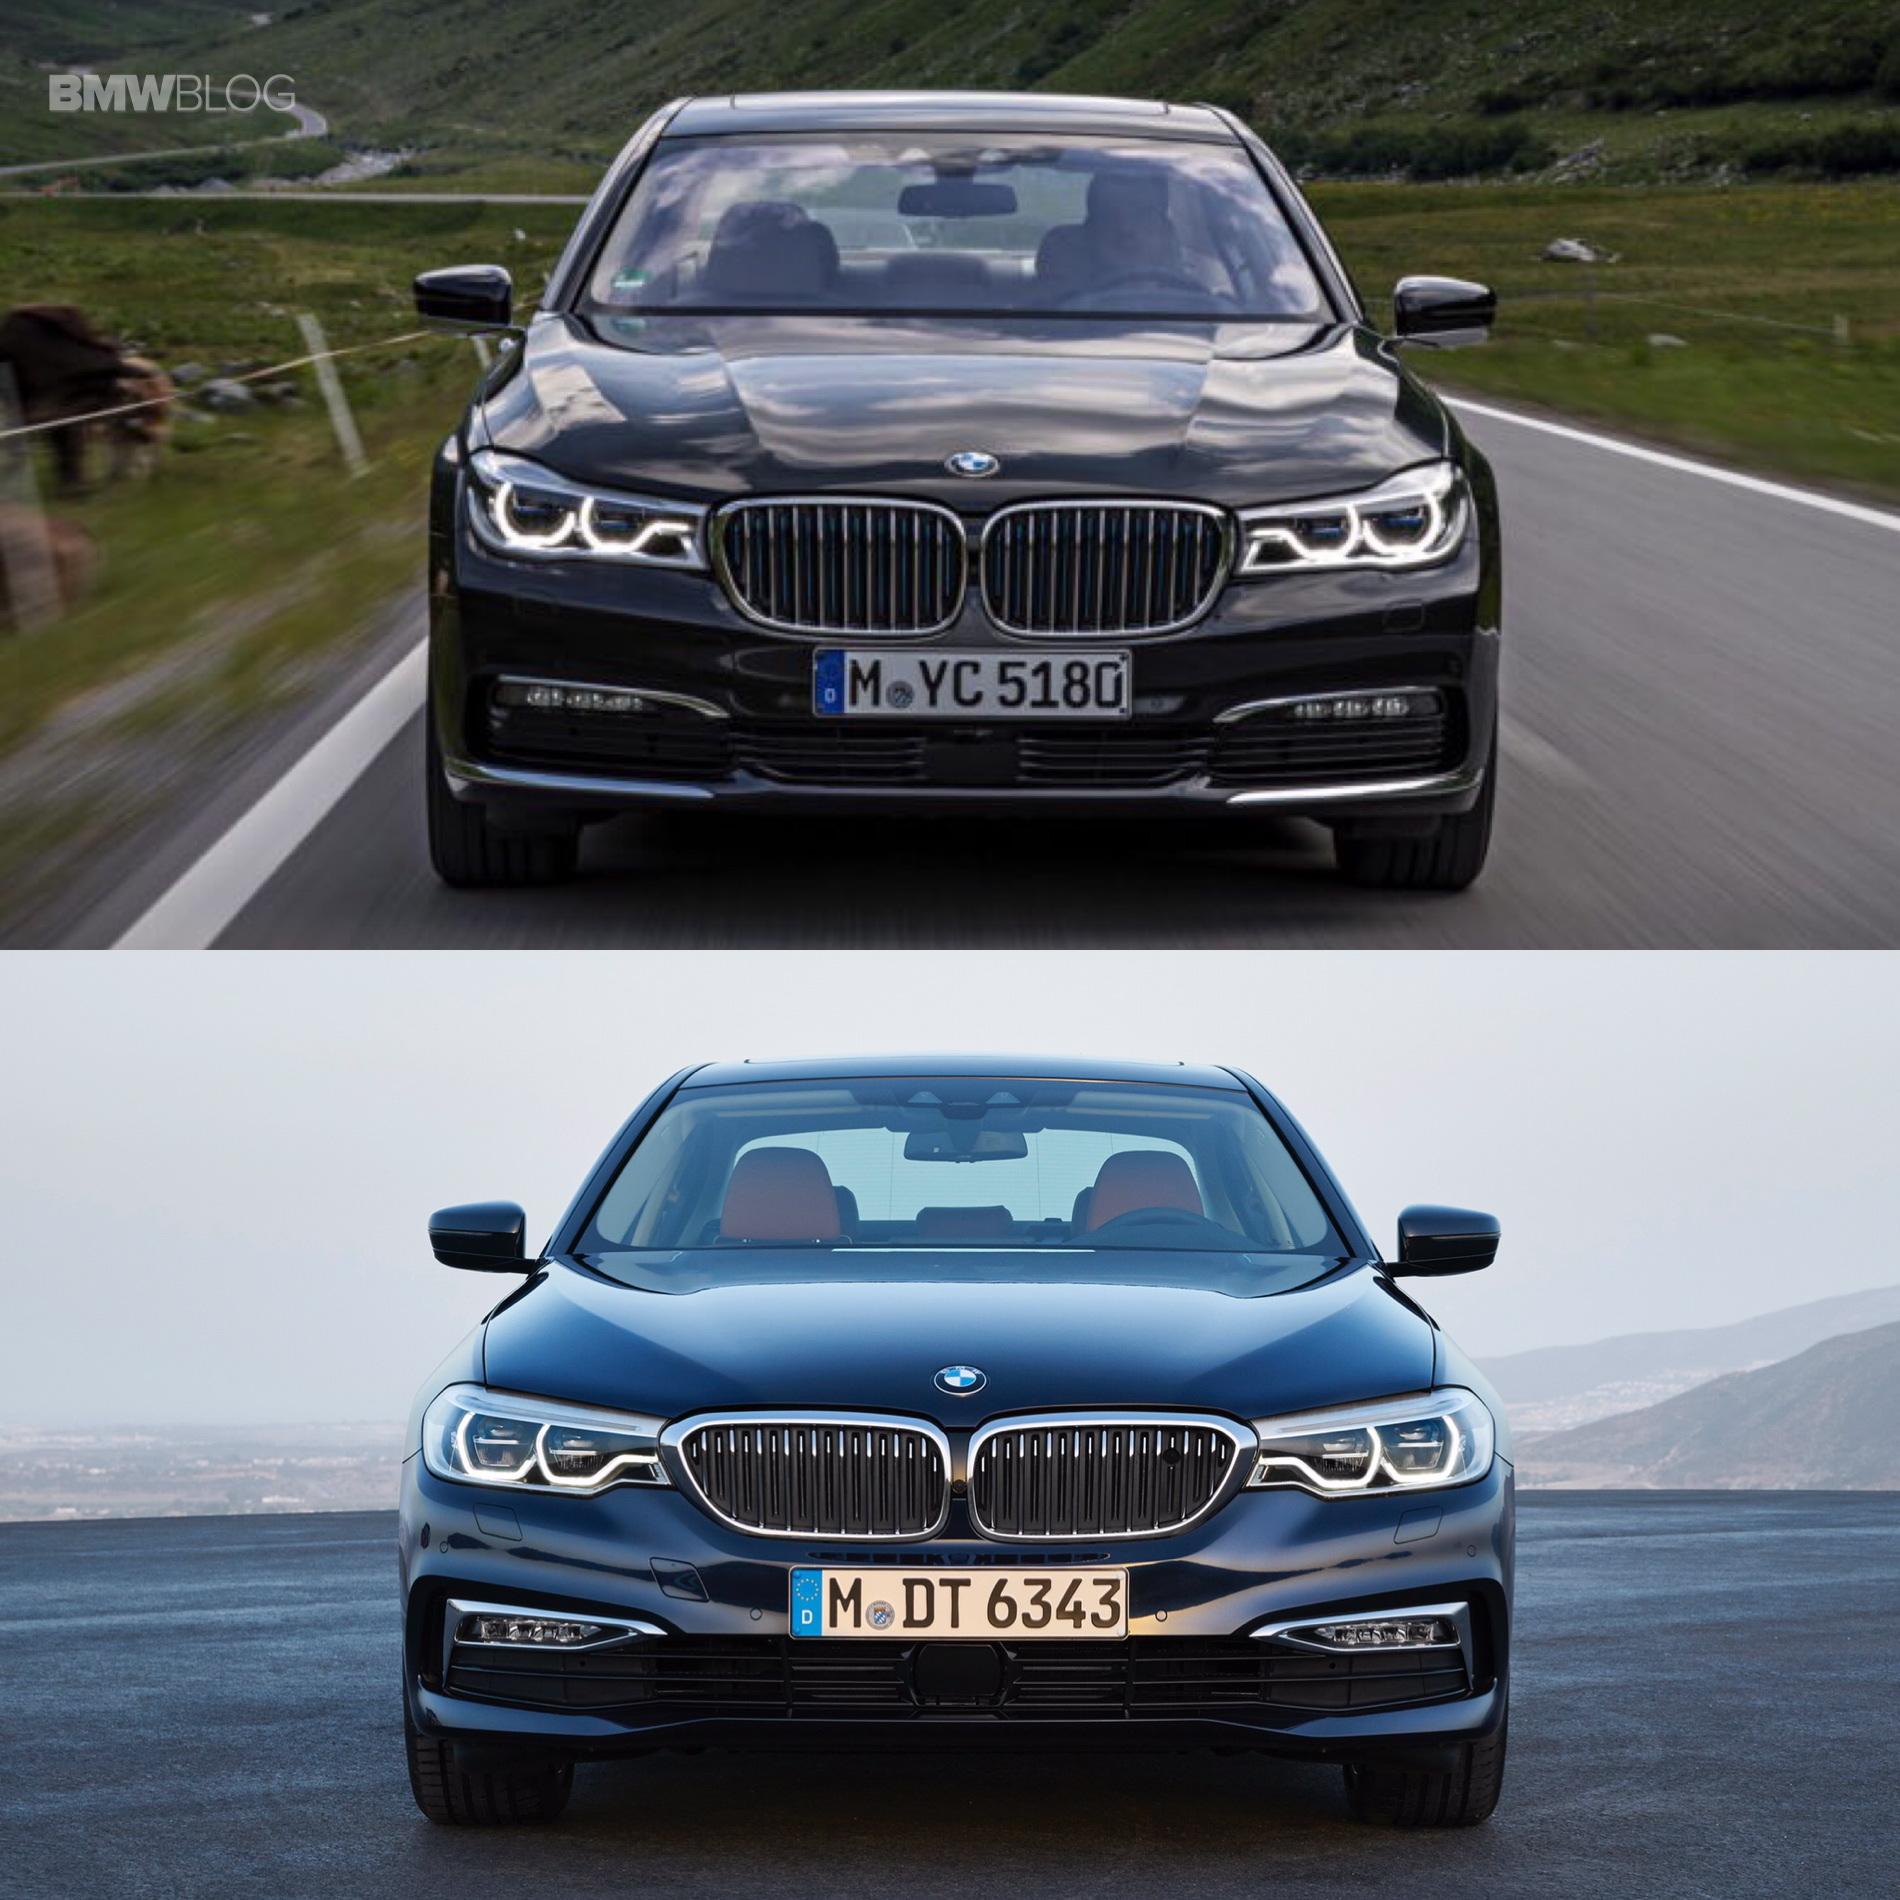 Bmw X7 M Series: 2017 BMW G30 5 Series Vs. BMW G11 7 Series